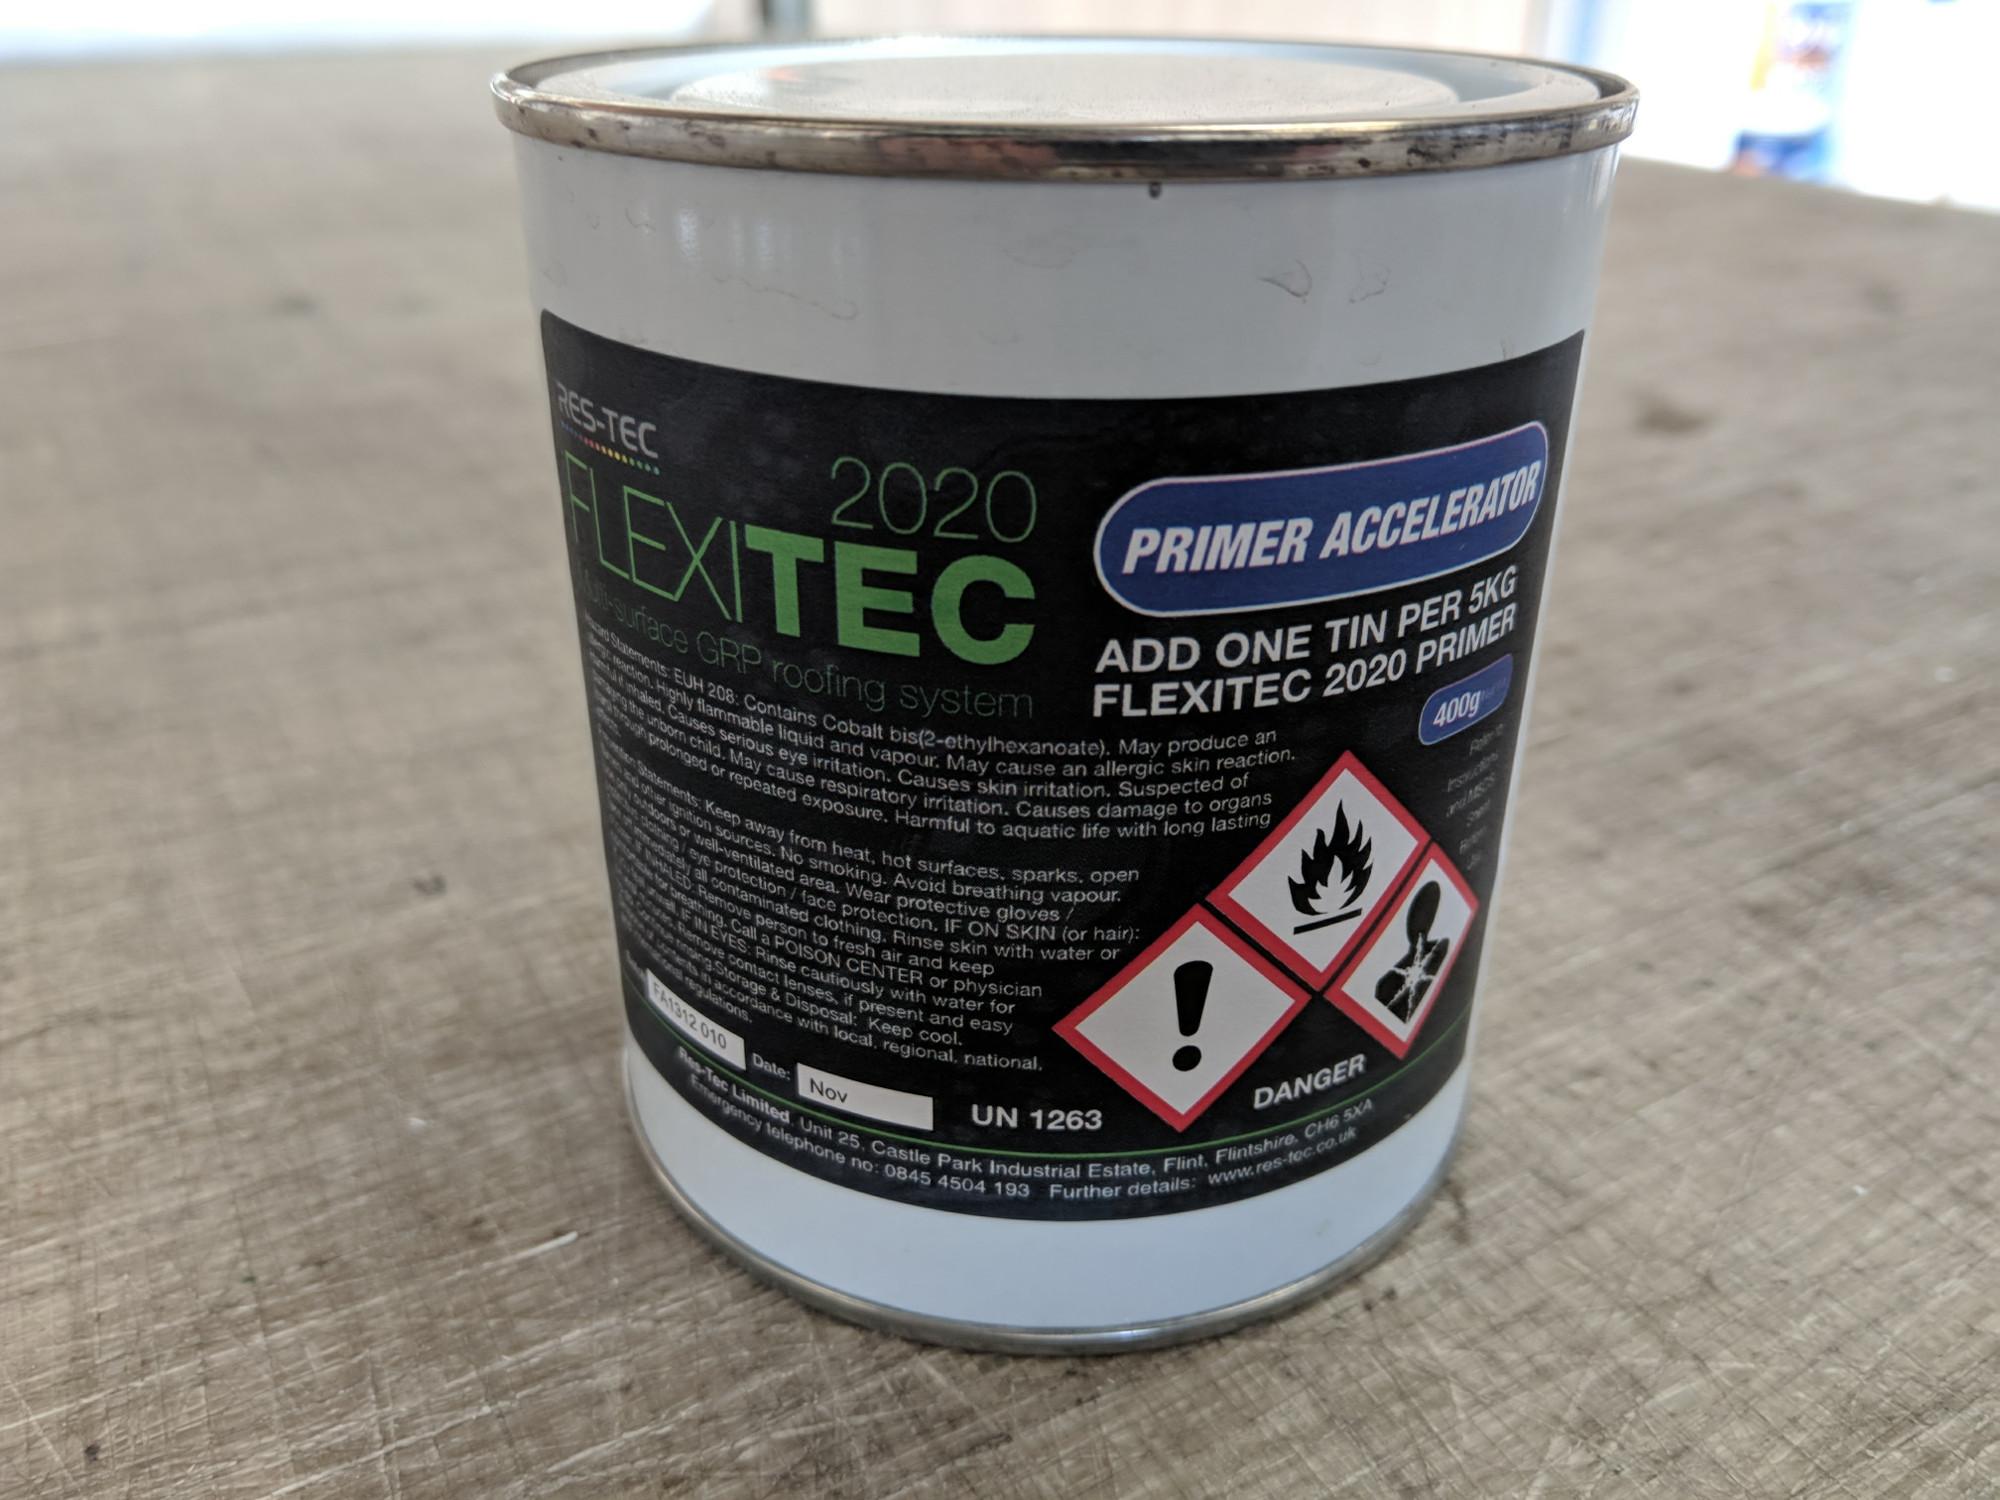 Flexitec Primer Accelerator 400g